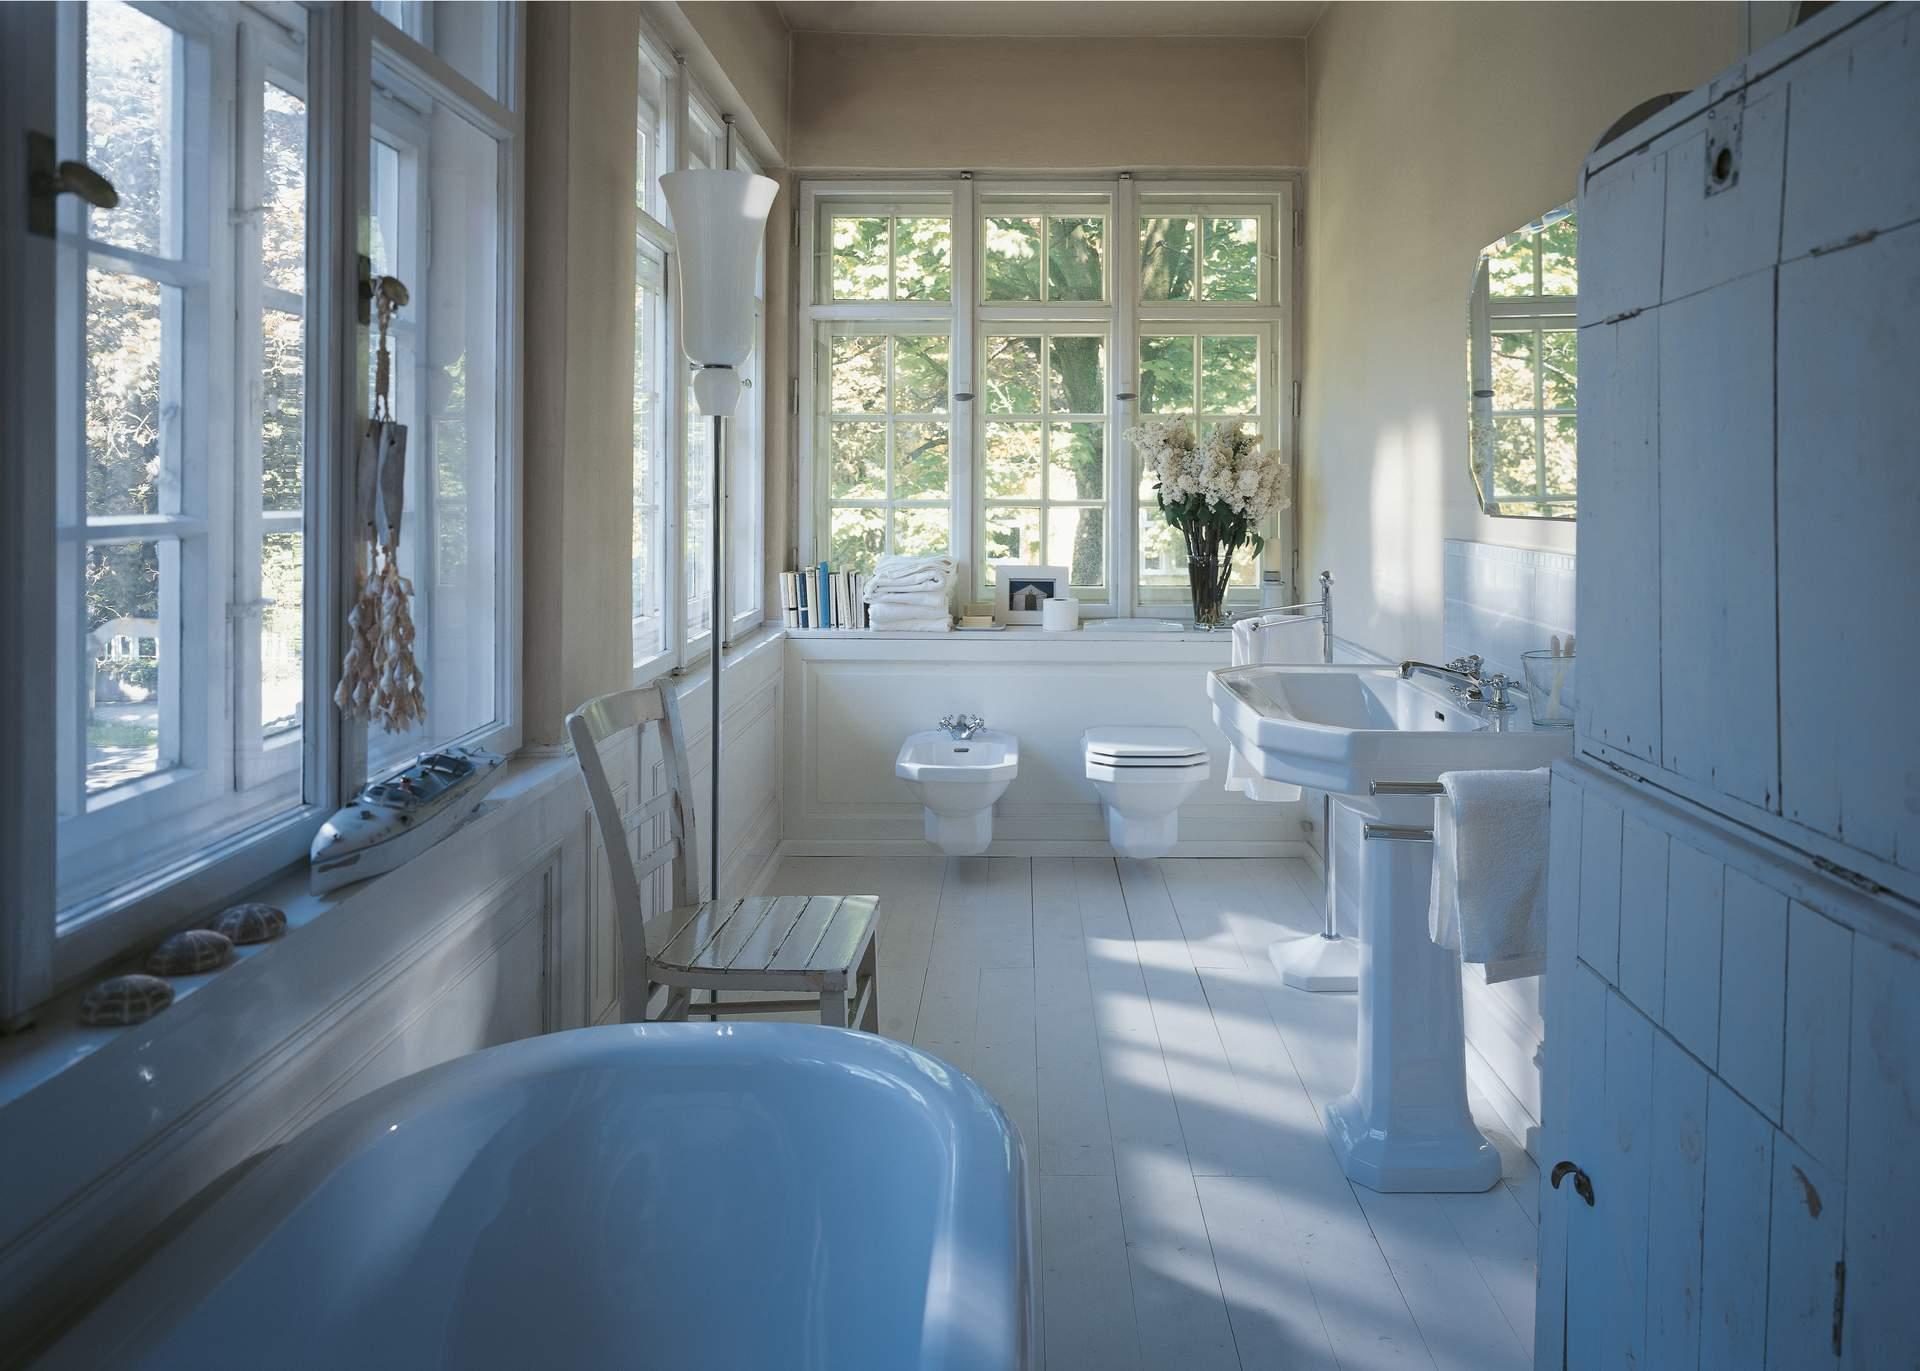 natura w łazience